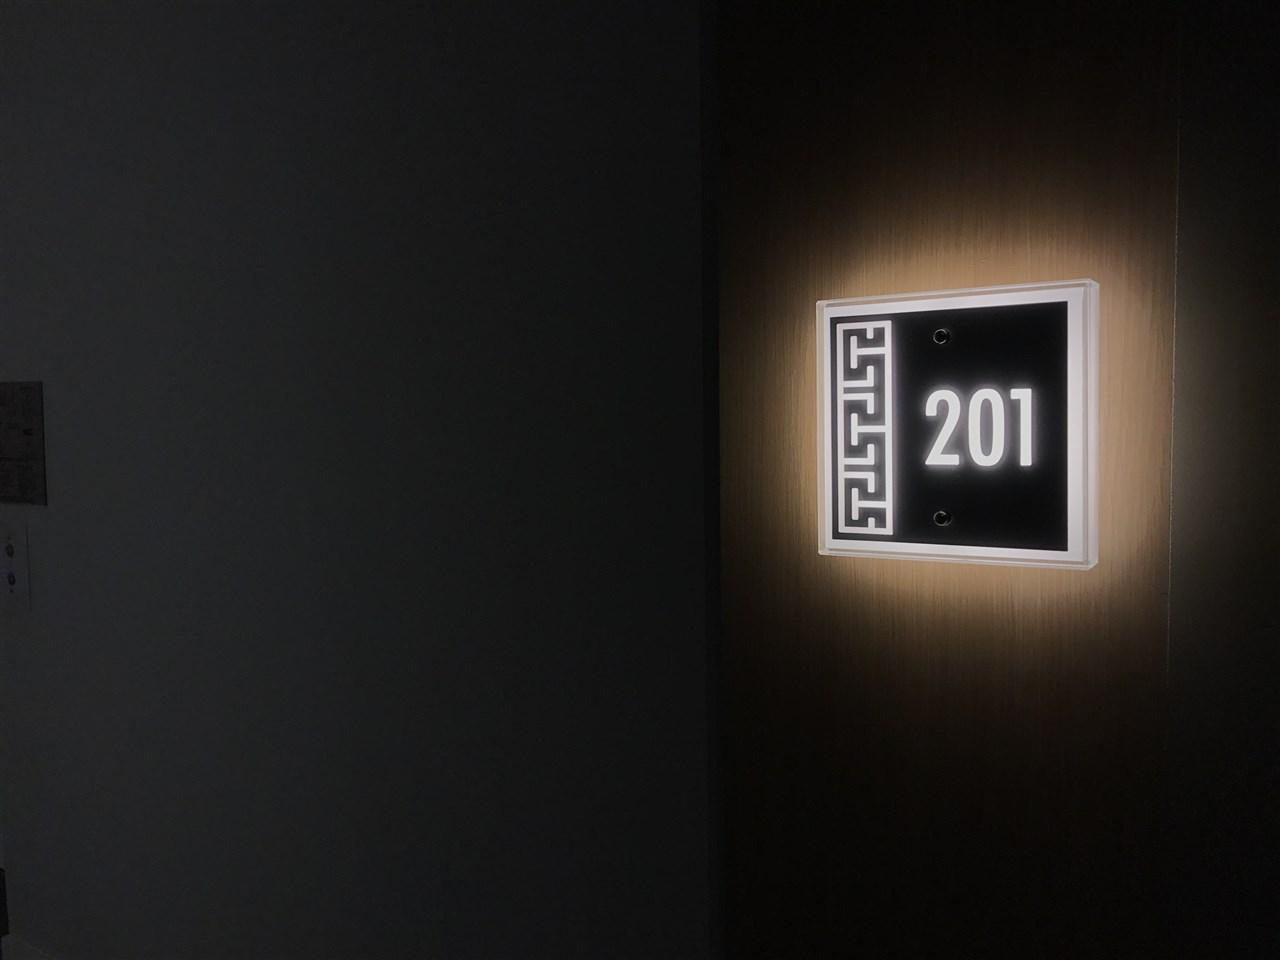 Condo Apartment at 201 505 W 30TH AVENUE, Unit 201, Vancouver West, British Columbia. Image 4